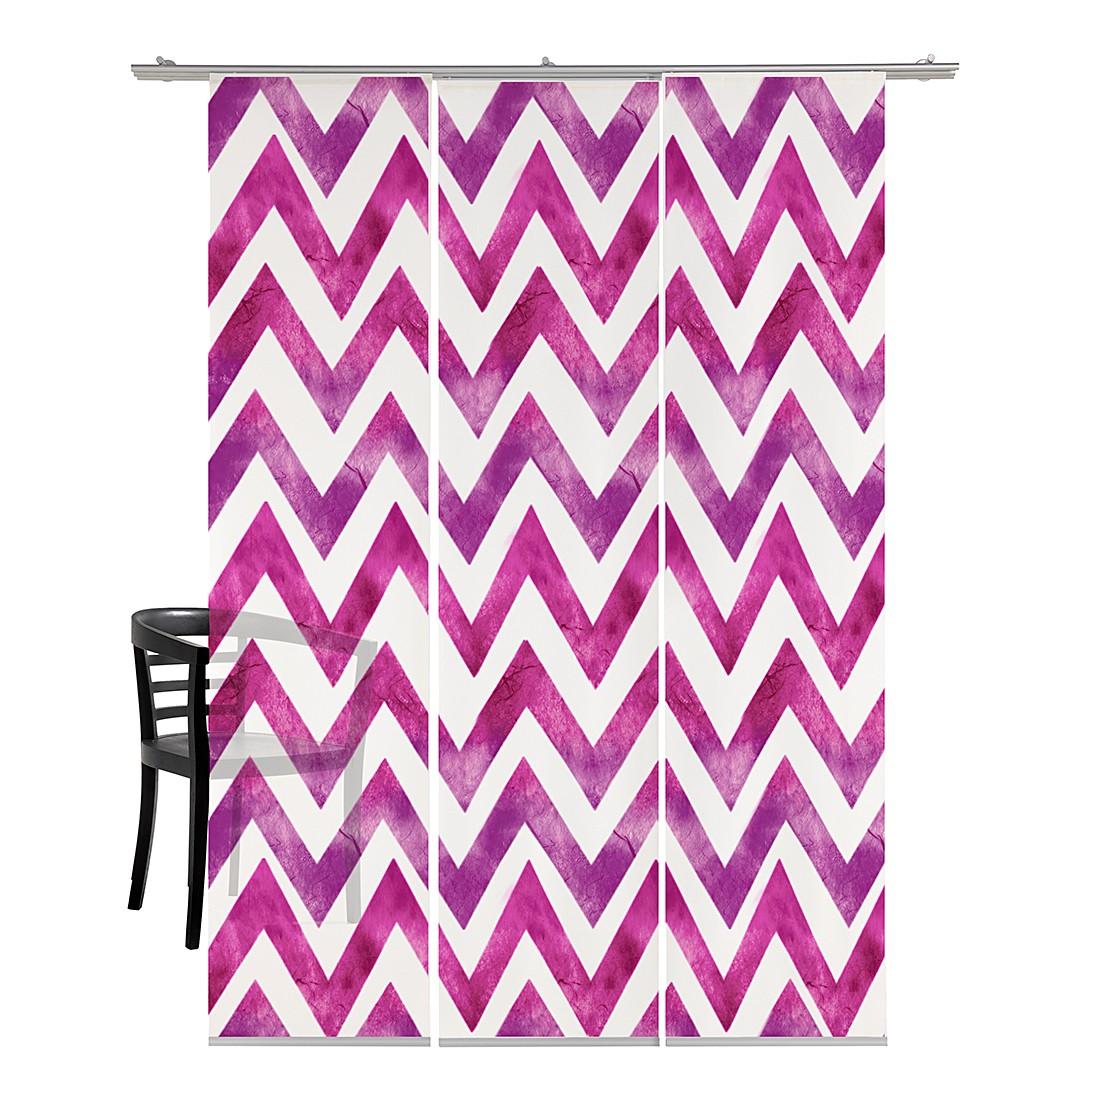 Flächenvorhang Zig-zag Batik – Pink, emotion textiles jetzt bestellen